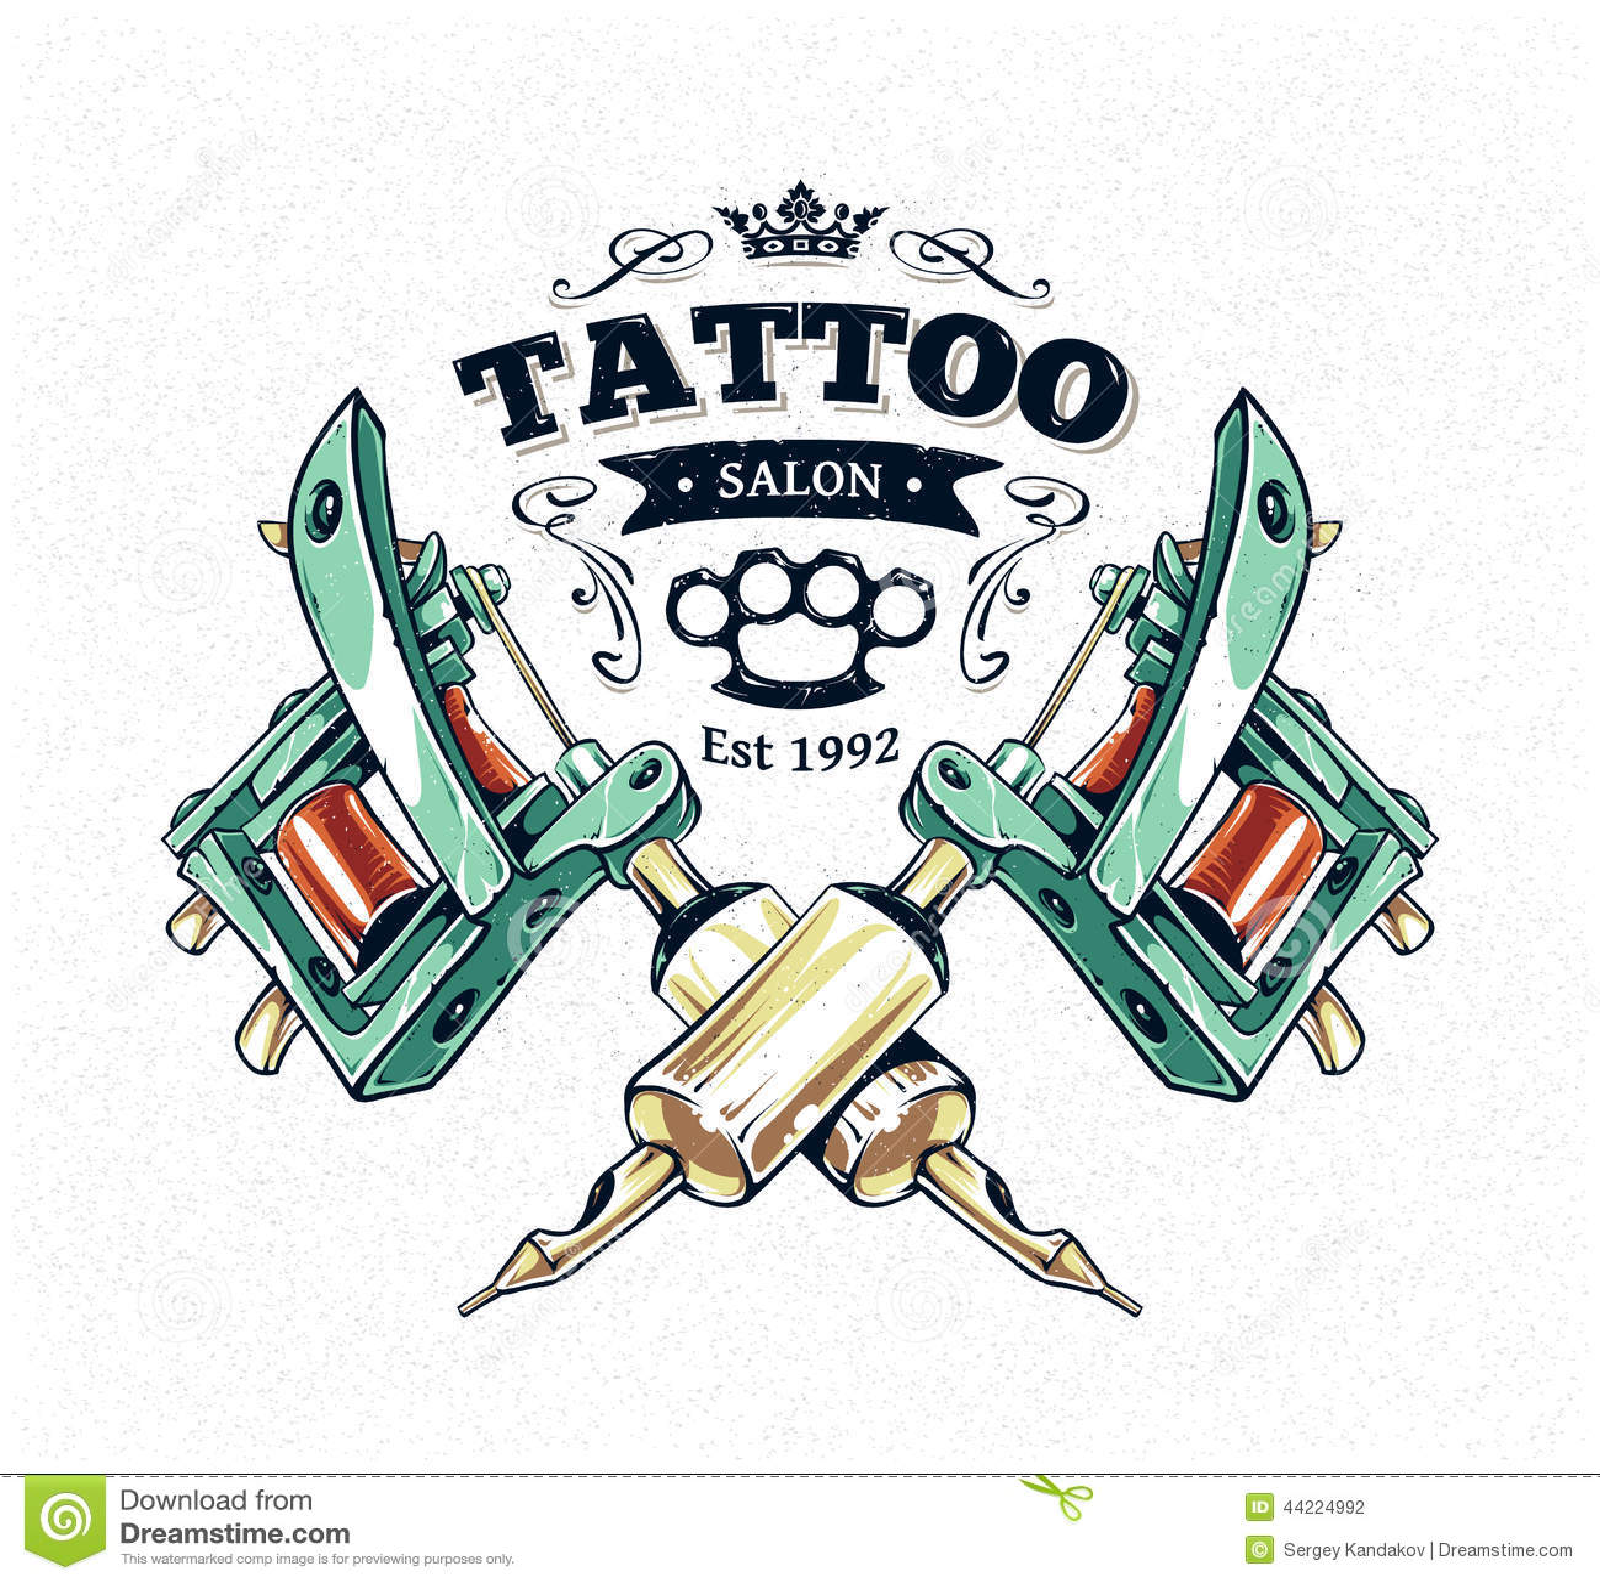 tattoo studio poster stock vector image 44224992. Black Bedroom Furniture Sets. Home Design Ideas